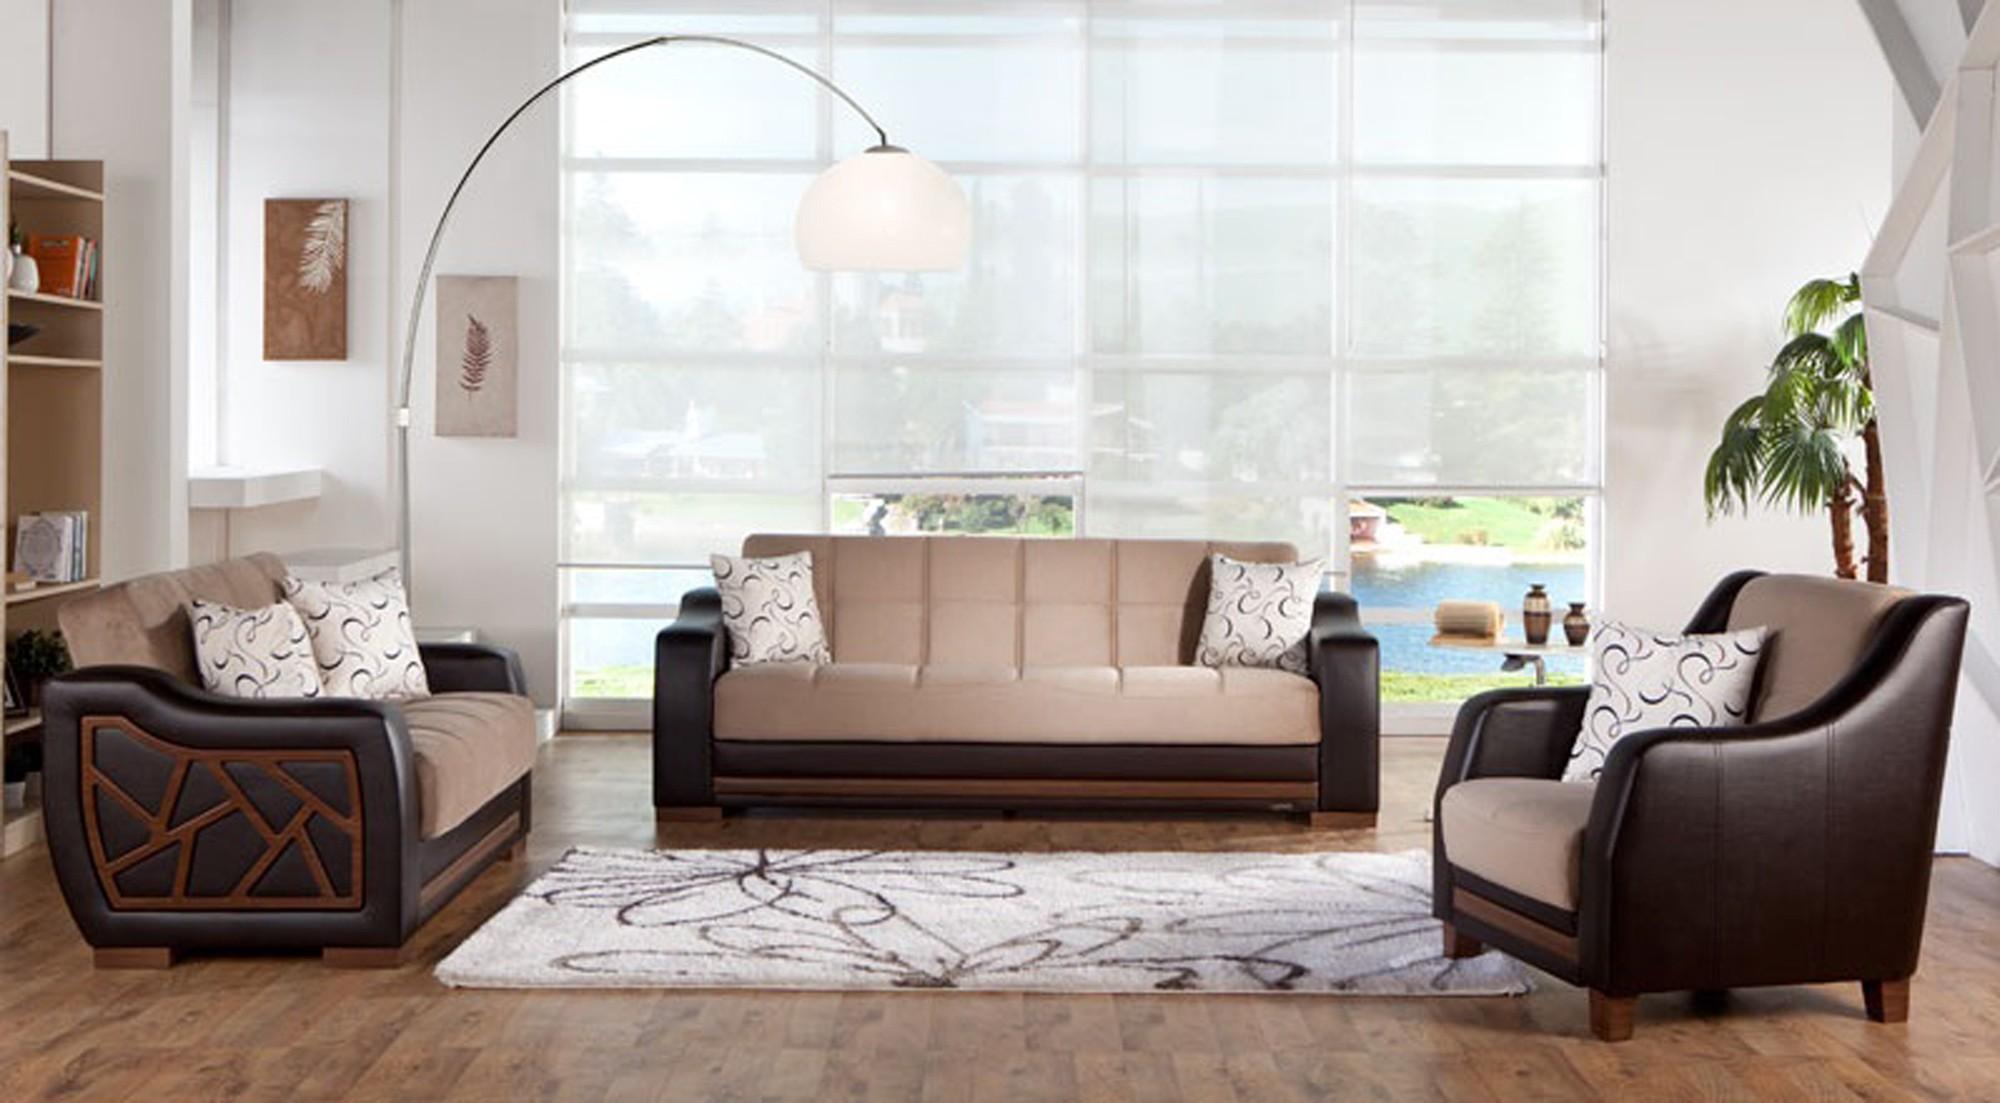 Hanzade 3 Seat Sleeper Naomi Vizon By Sunset Buy From Nova